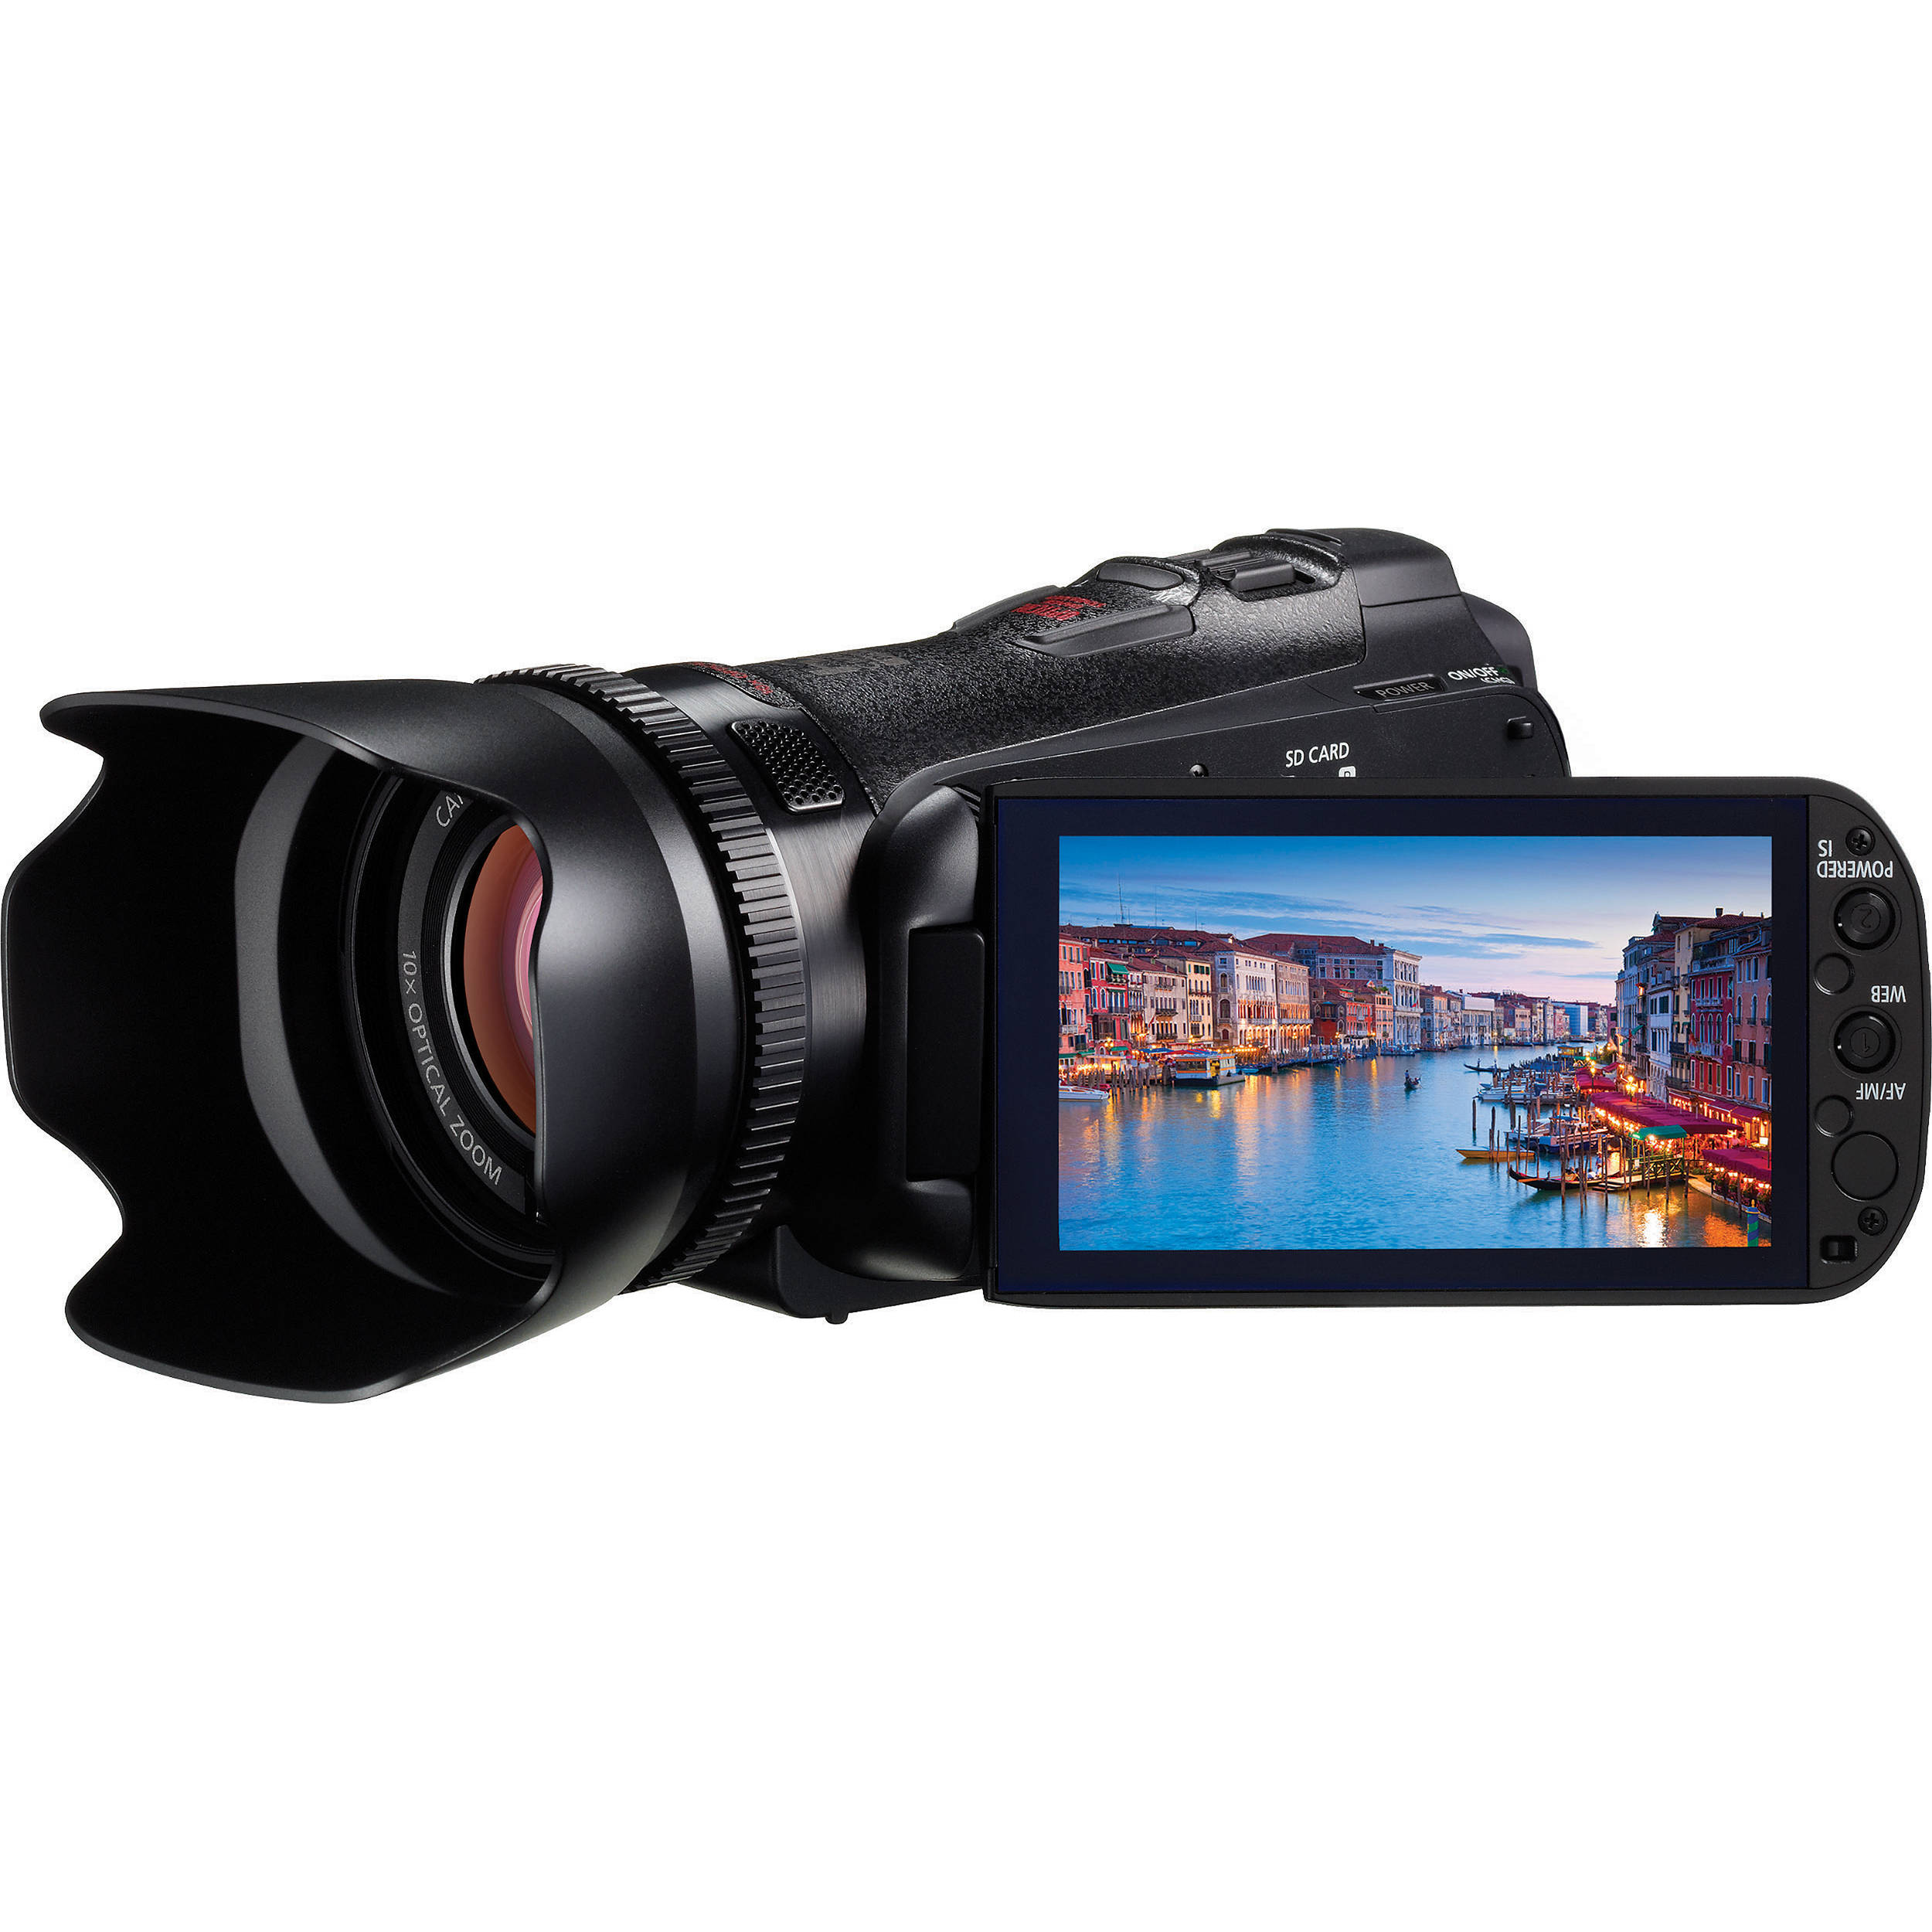 canon legria hf g10 flash memory pal camcorder hfg10e b h photo rh bhphotovideo com canon vixia hf g10 manual español canon legria g10 manual